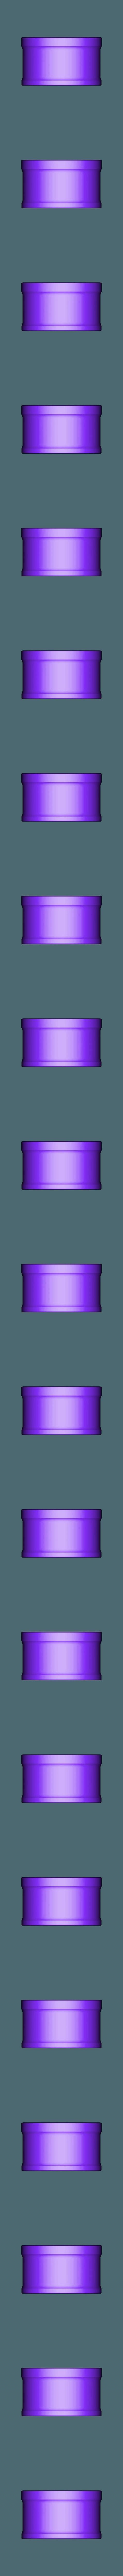 a (4).stl Download STL file 48 Head Multi Cyclone Chamber (Compact Size Added) • 3D printer model, kanadali